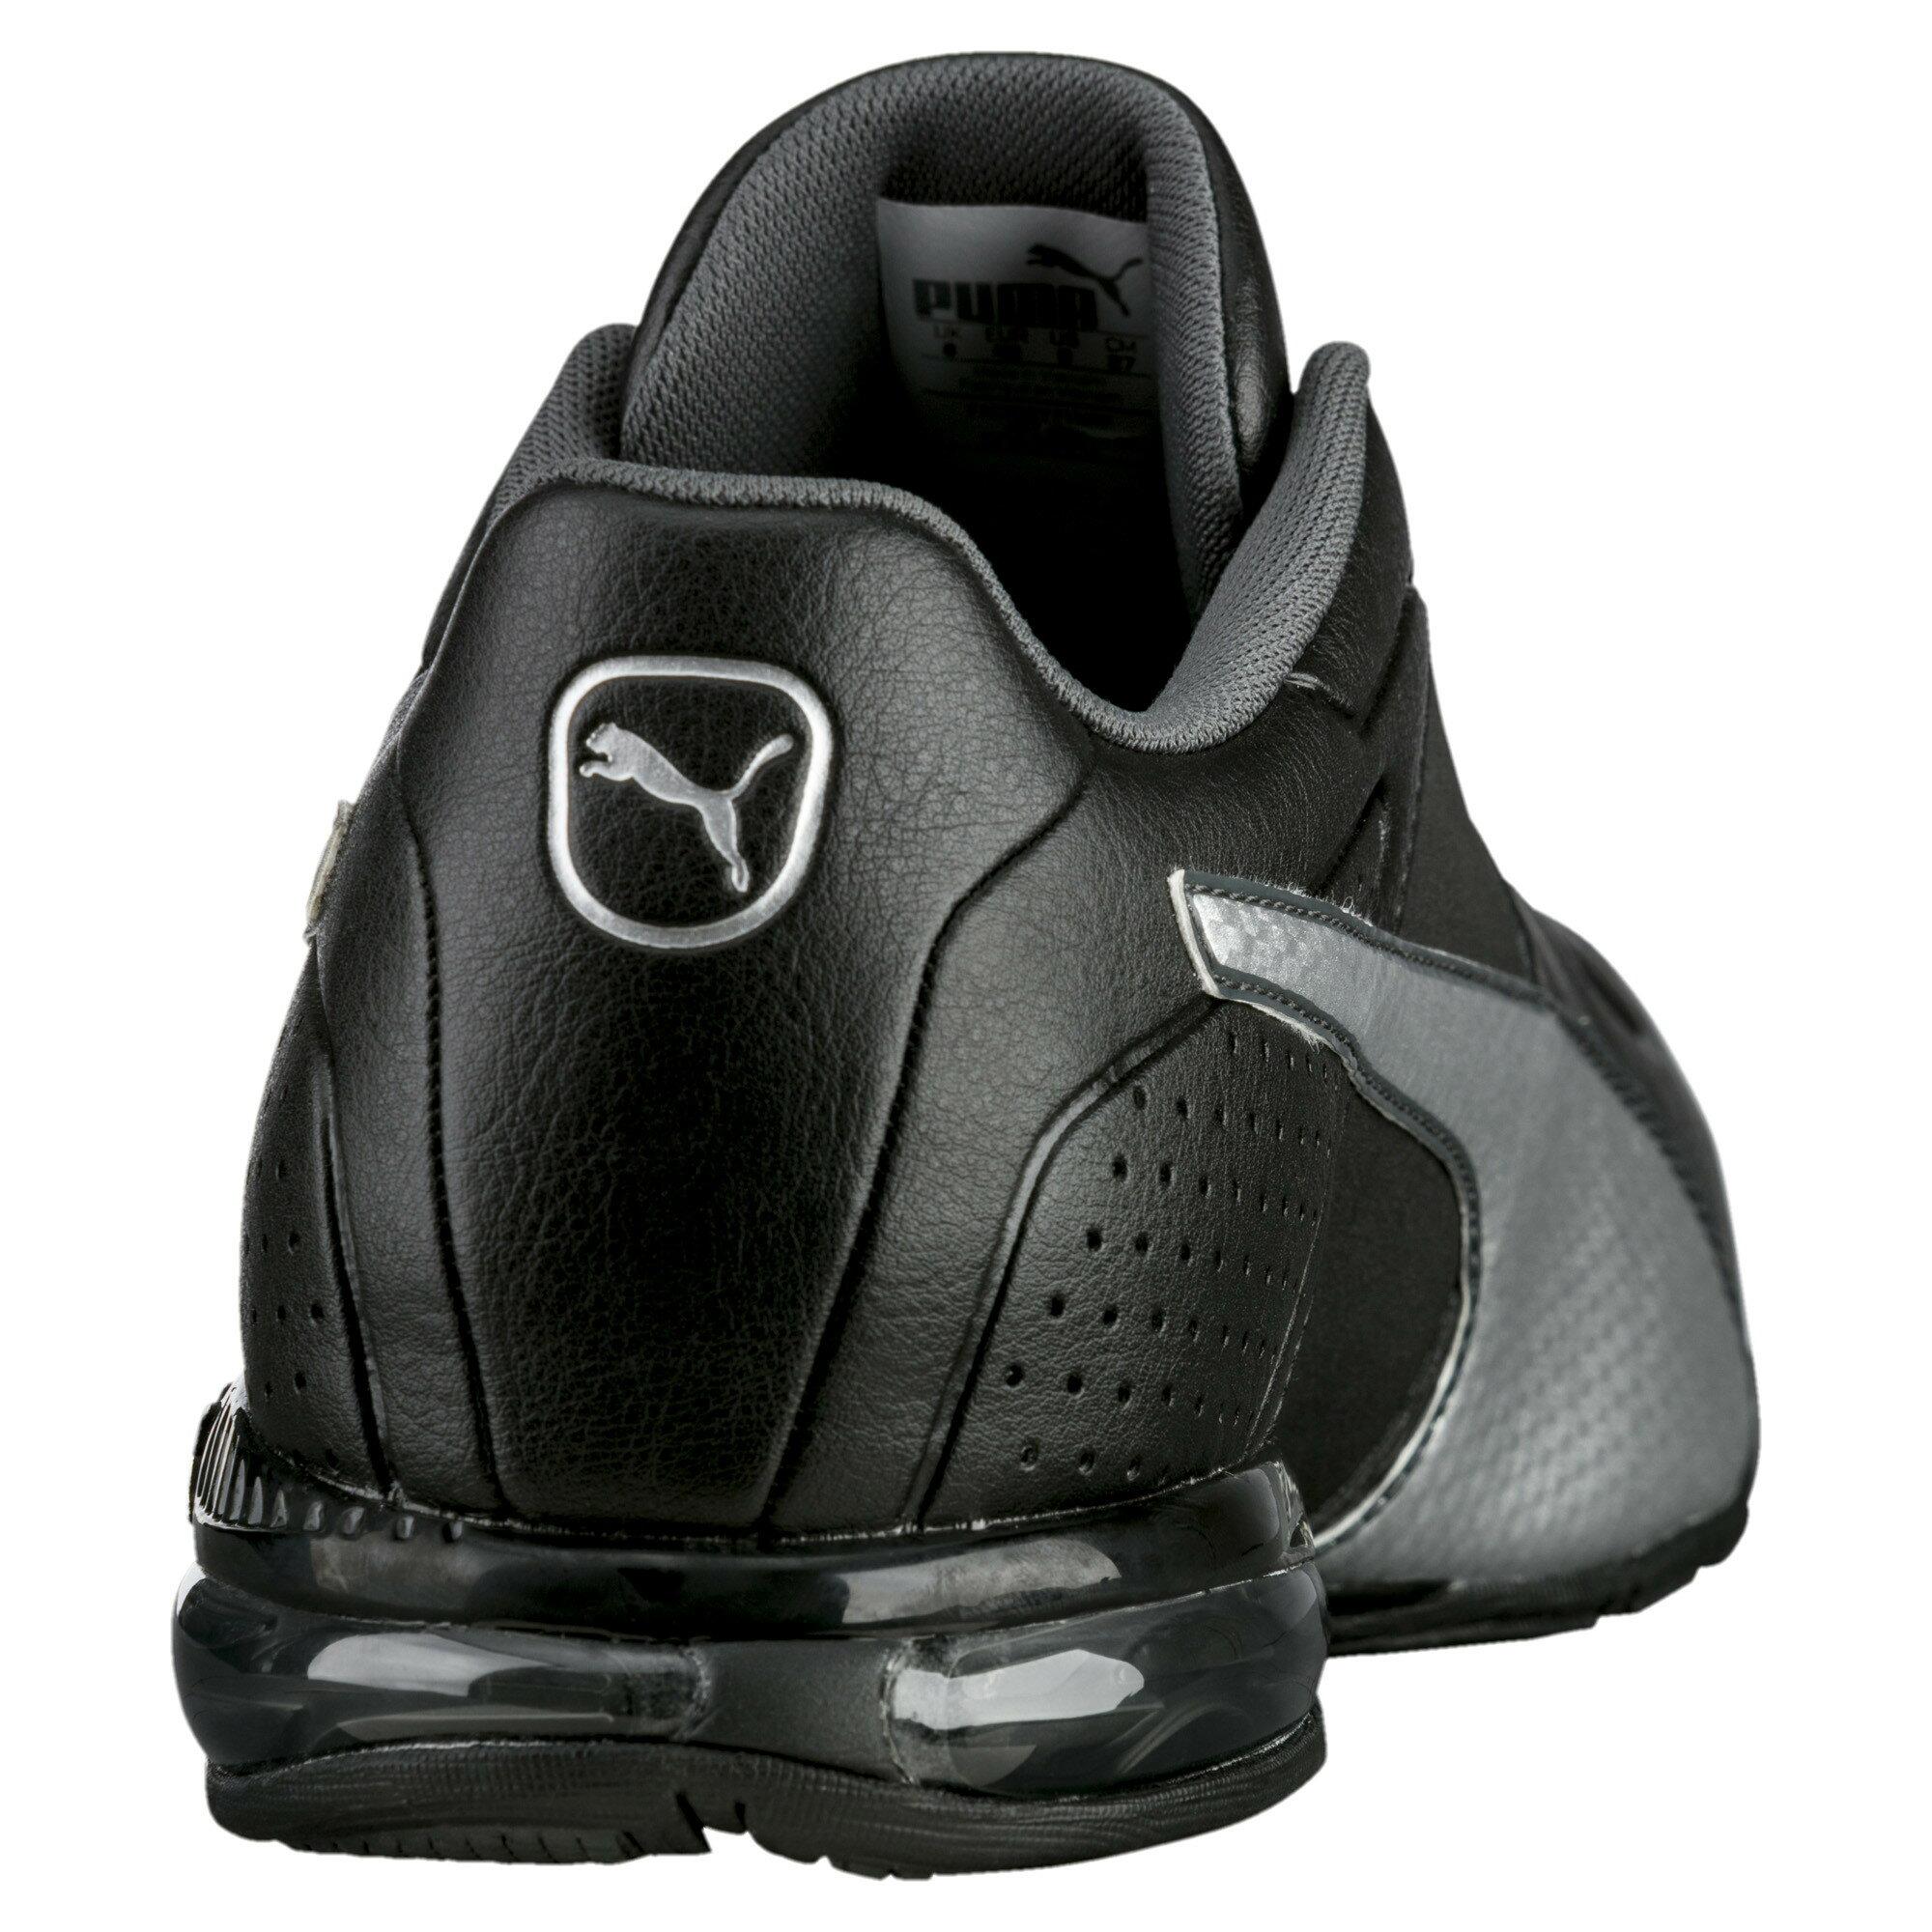 ce336a5c696787 Official Puma Store  PUMA Cell Surin 2 FM Men s Running Shoes ...